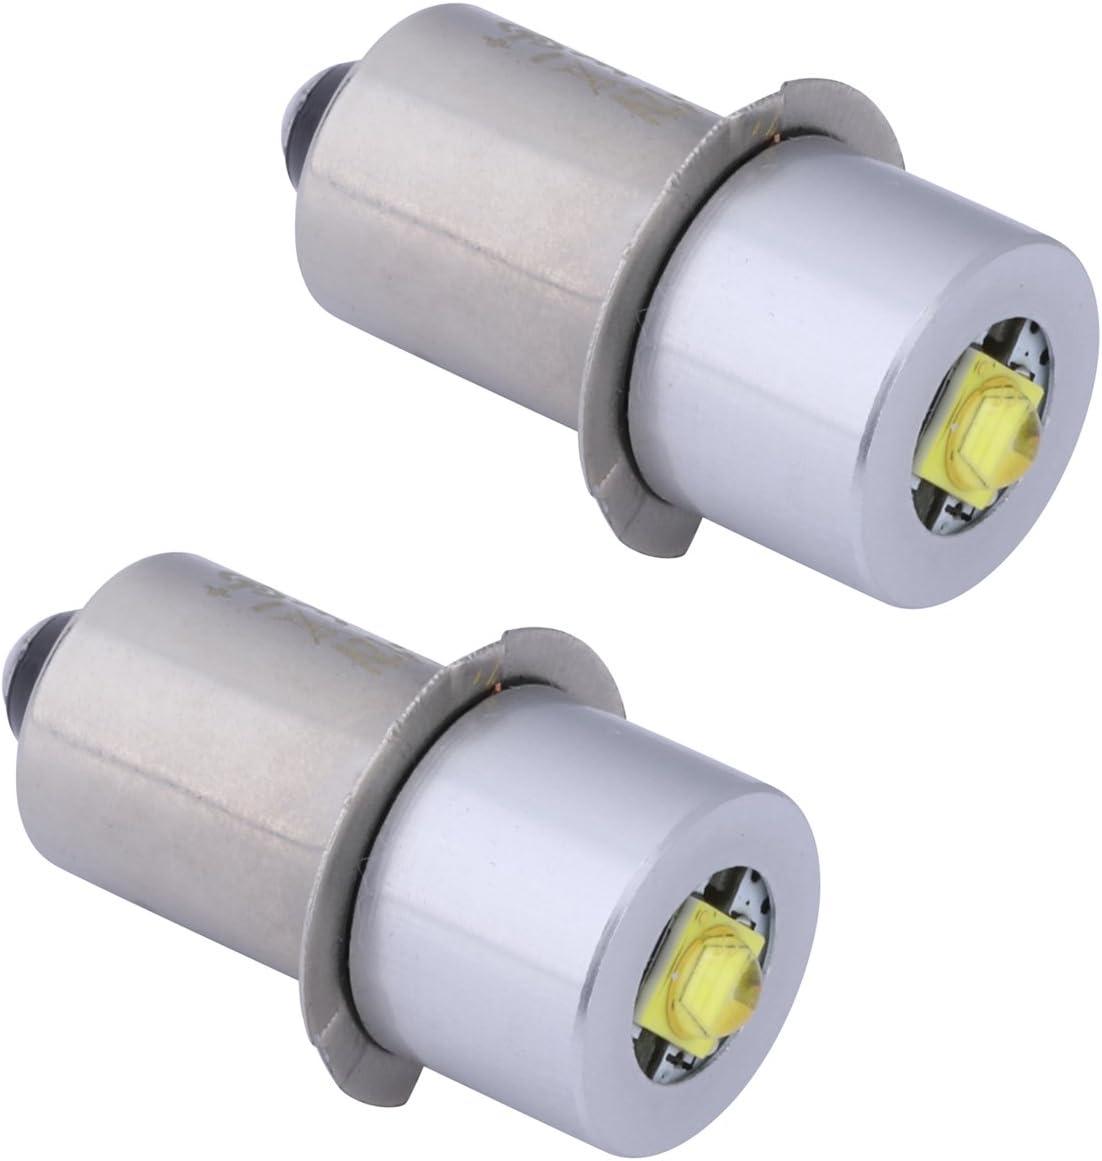 JOMITOP 18v 19.2v 6v 9v 12v 24v Volt Led Flashlight Bulb Led Upgrade Bulb for Ryobi Milwaukee Craftsman 6-24 Voltage Lamp Maglite Flashlight DC Replacement Bulbs Led Conversion Kit